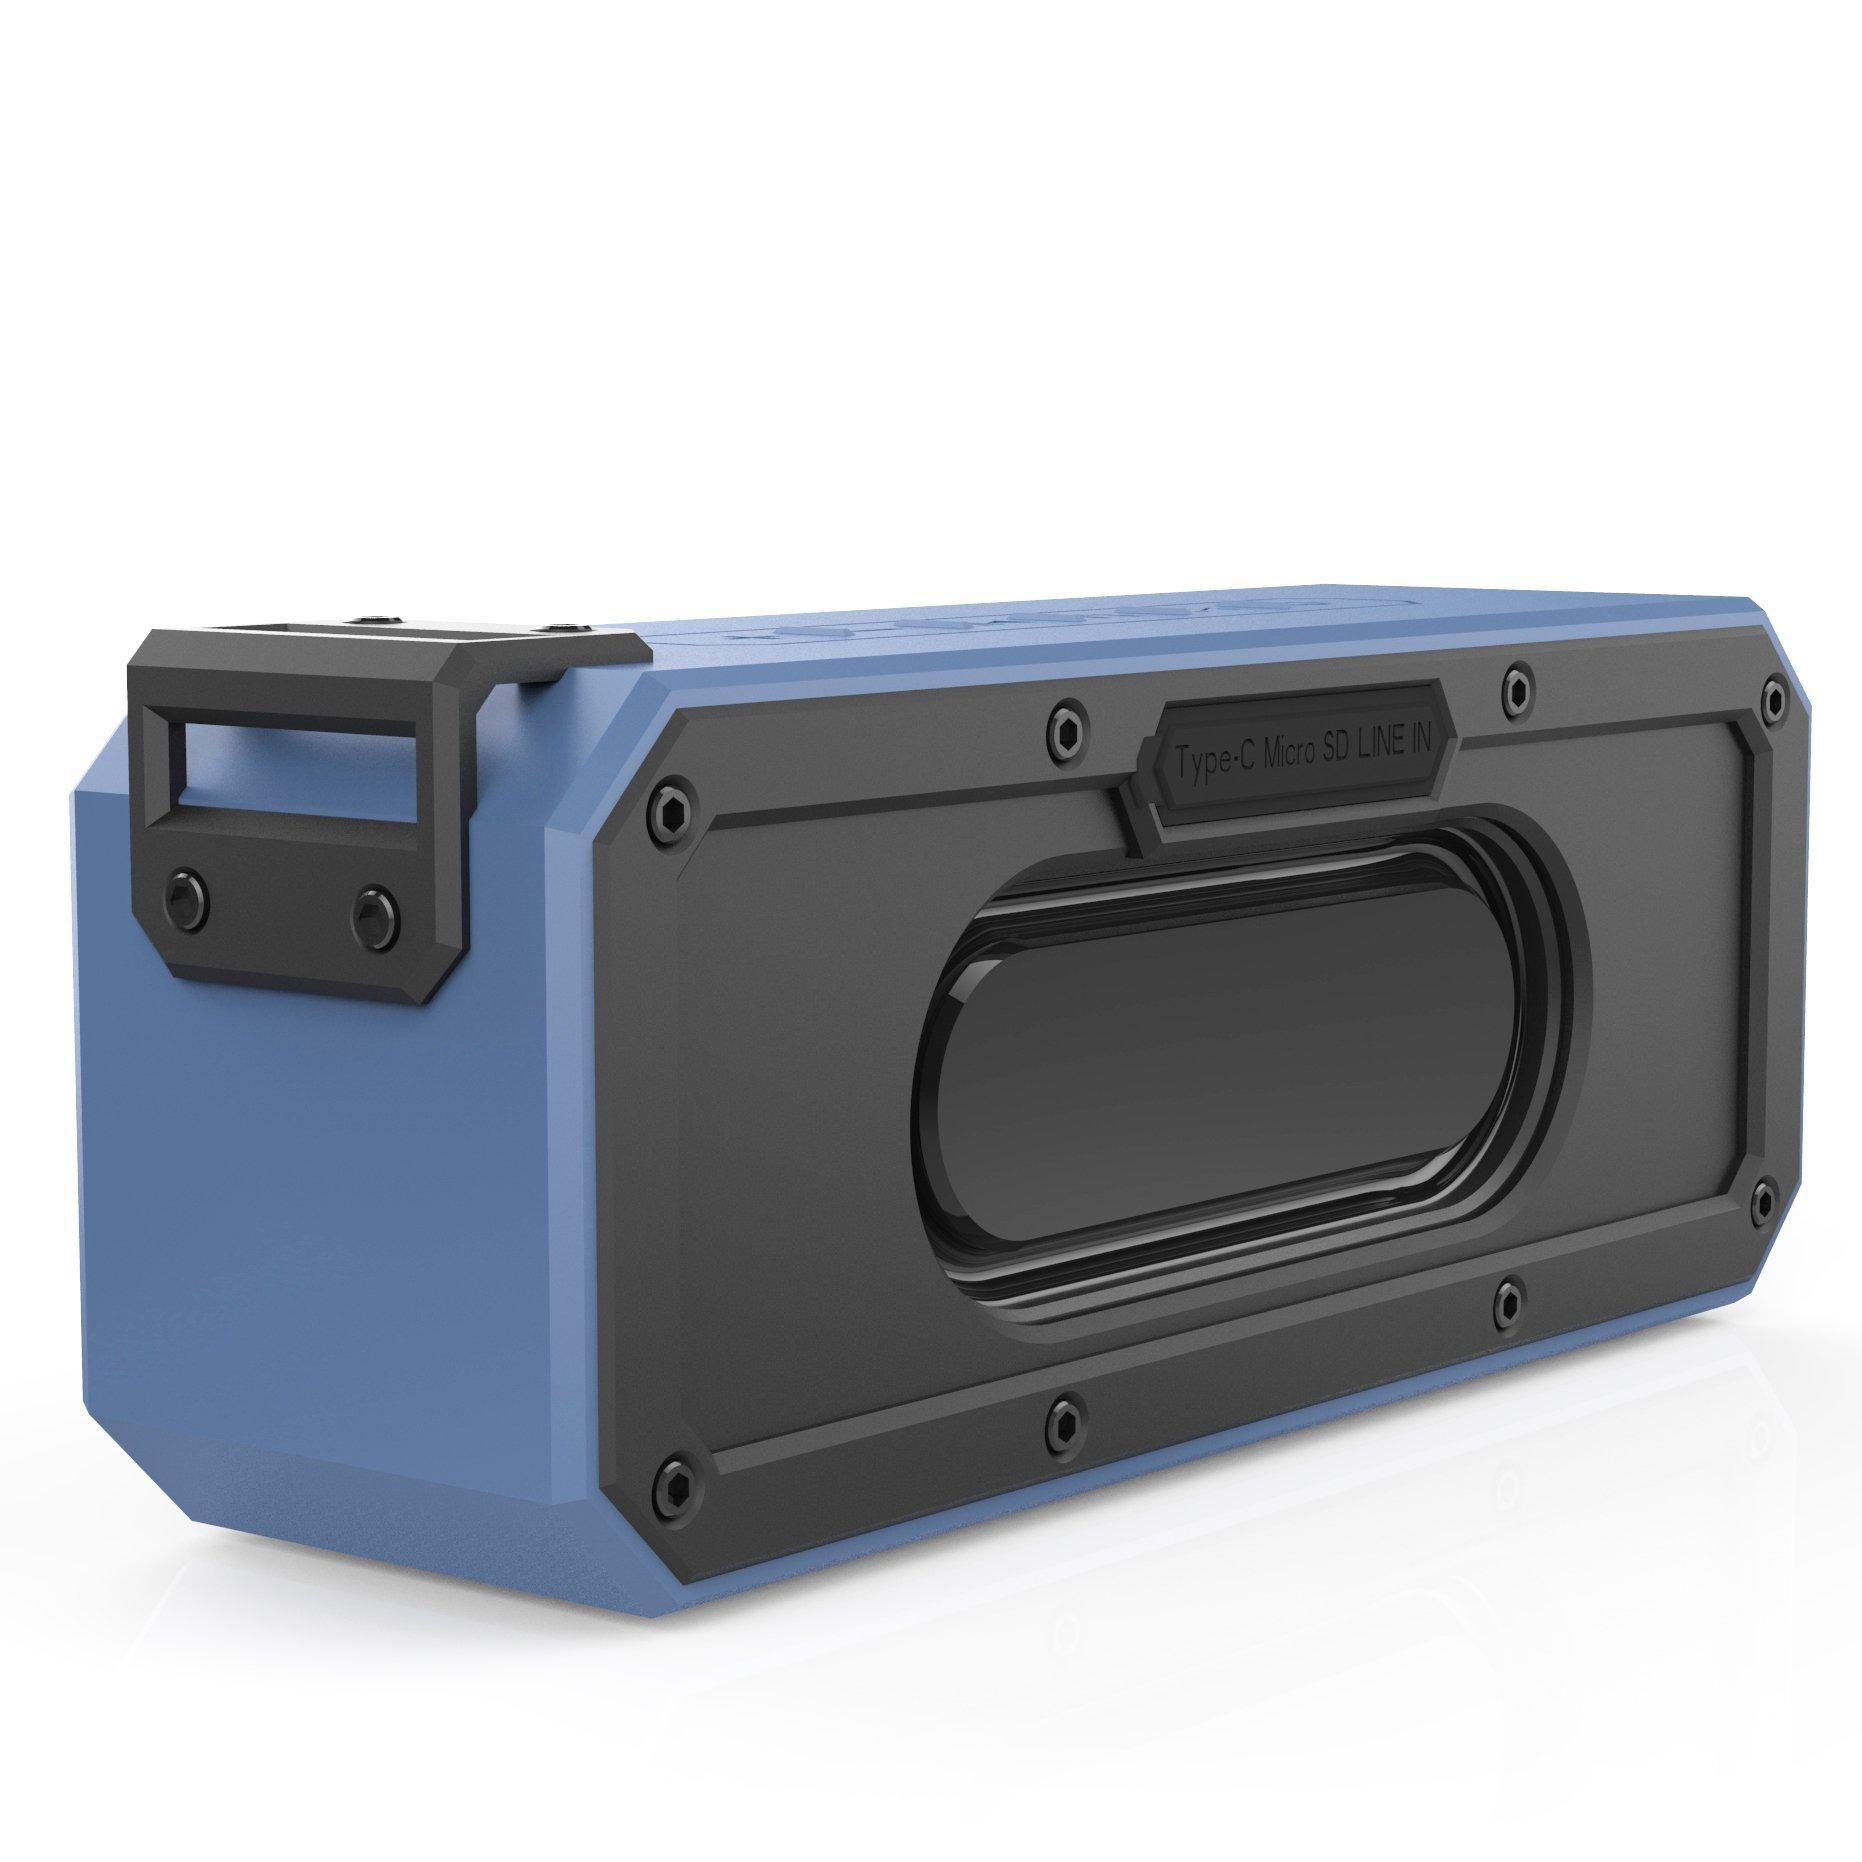 Parlante Bluetooth Sinoband S400 Plus 40w Waterproof Ipx7 Du